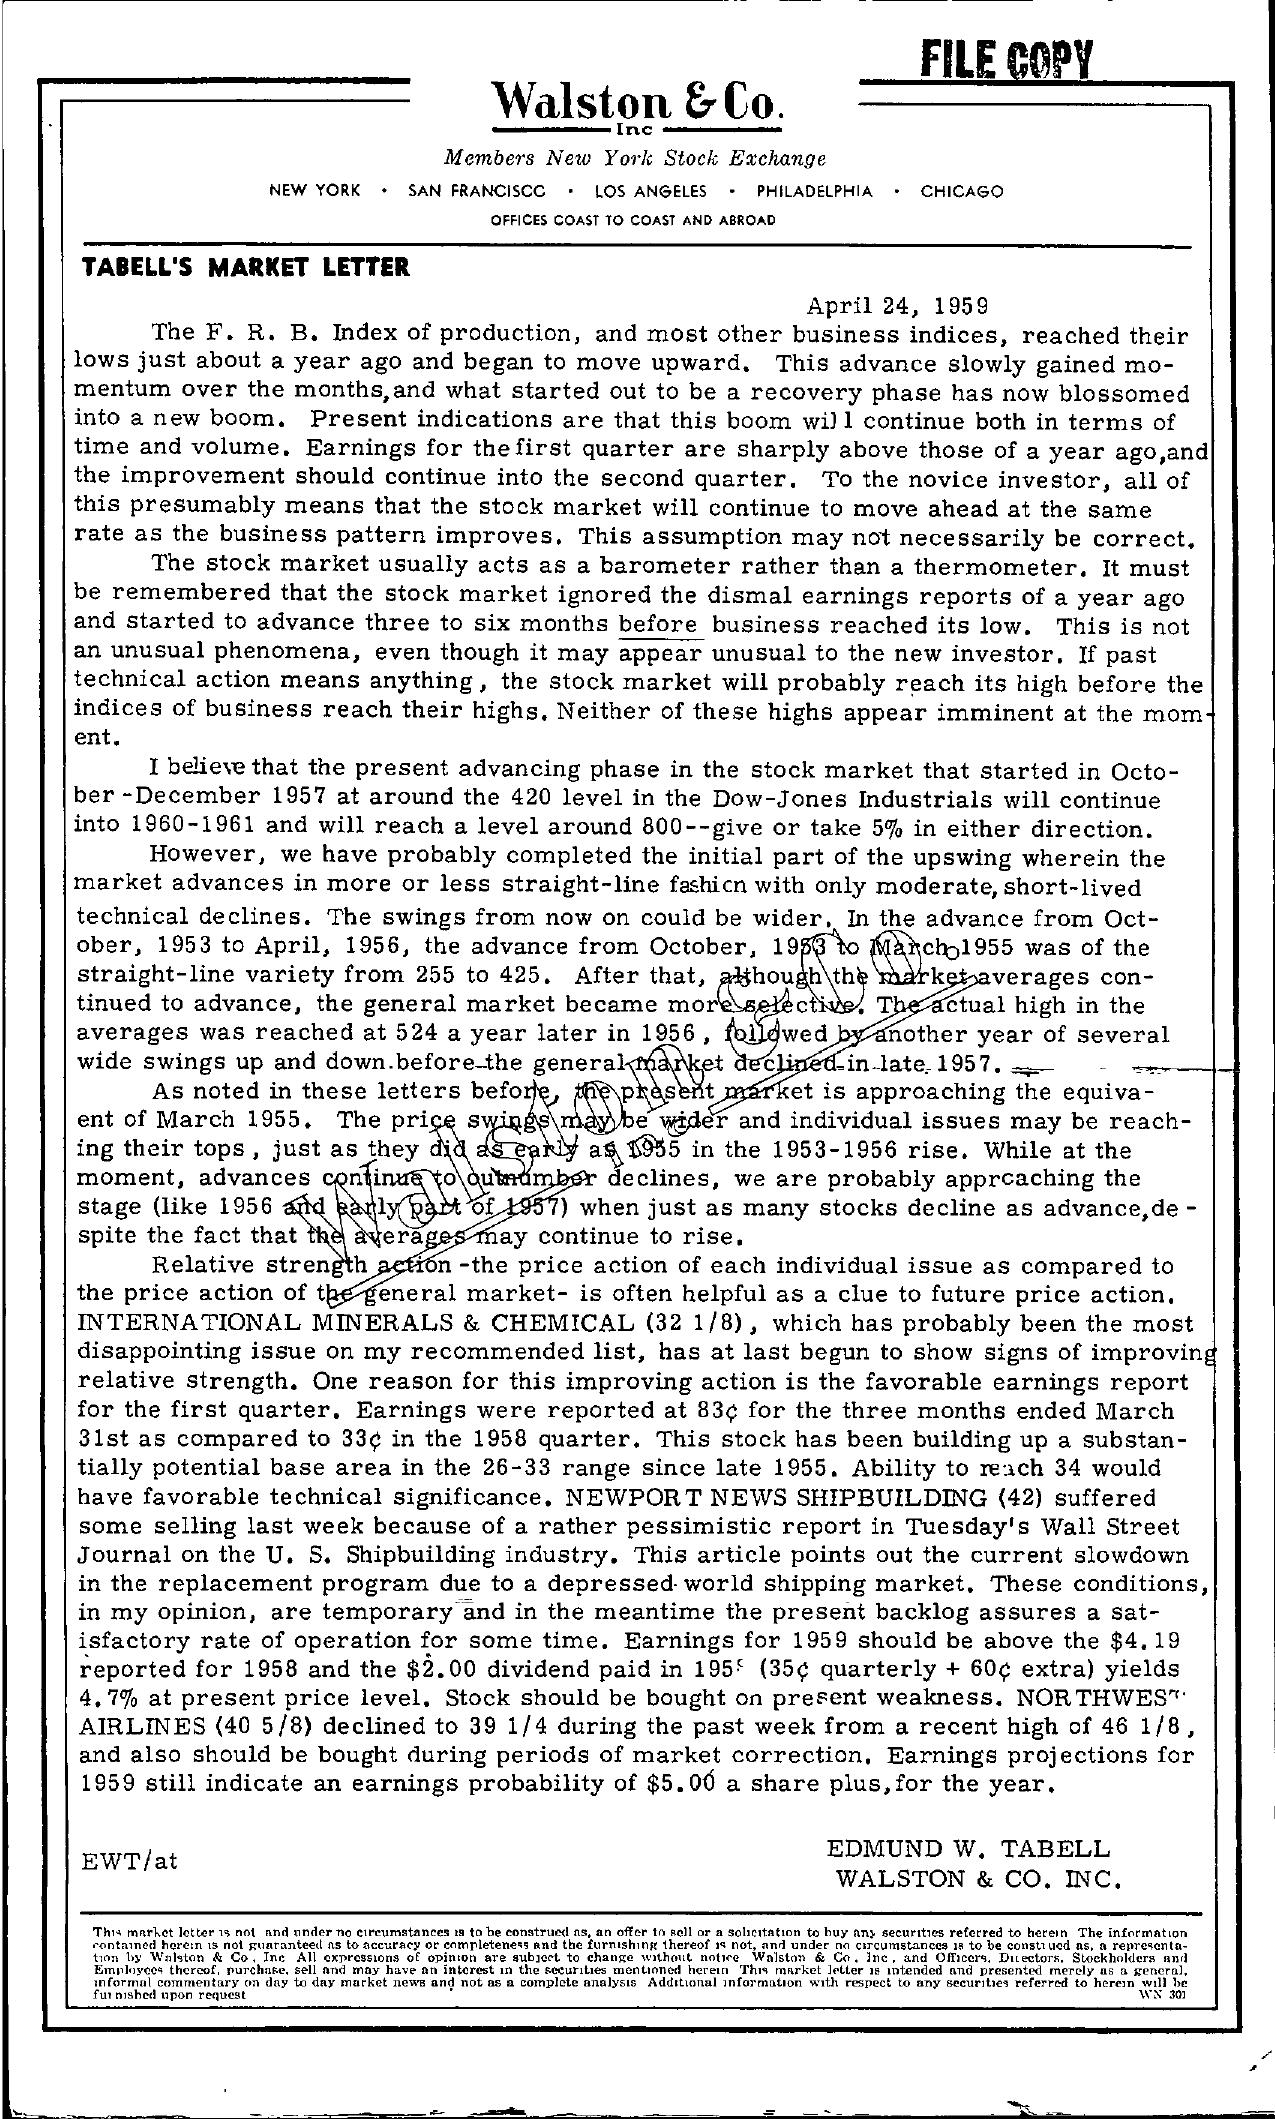 Tabell's Market Letter - April 24, 1959